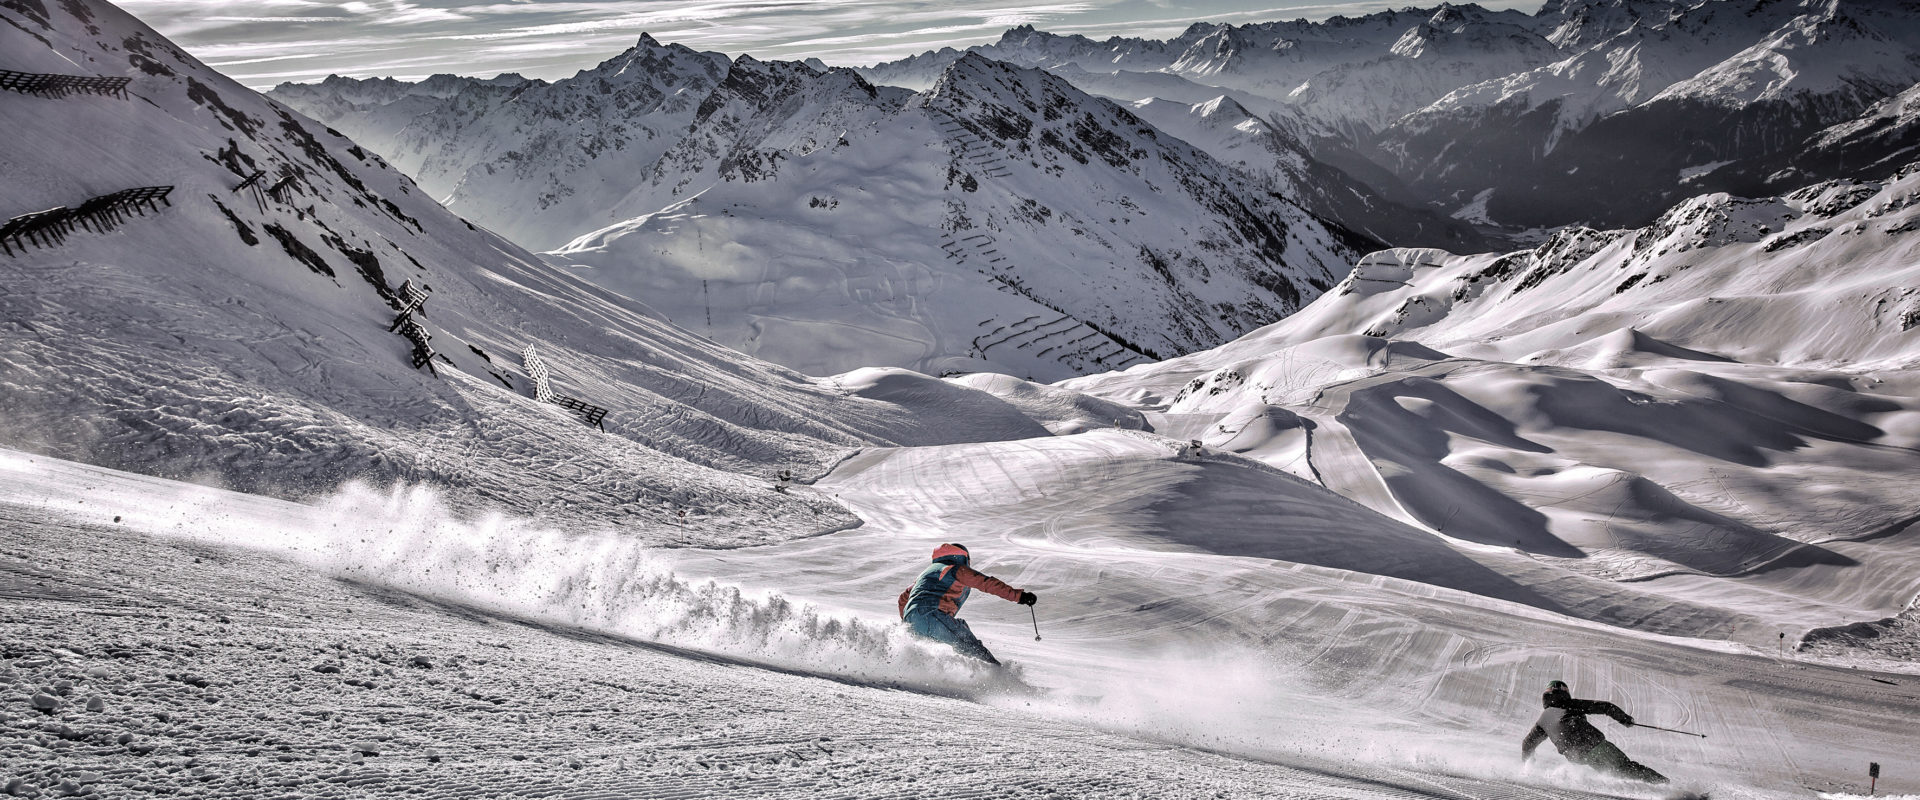 Bewegen! Sonnenaufgangsfahrt Silvretta Montafon